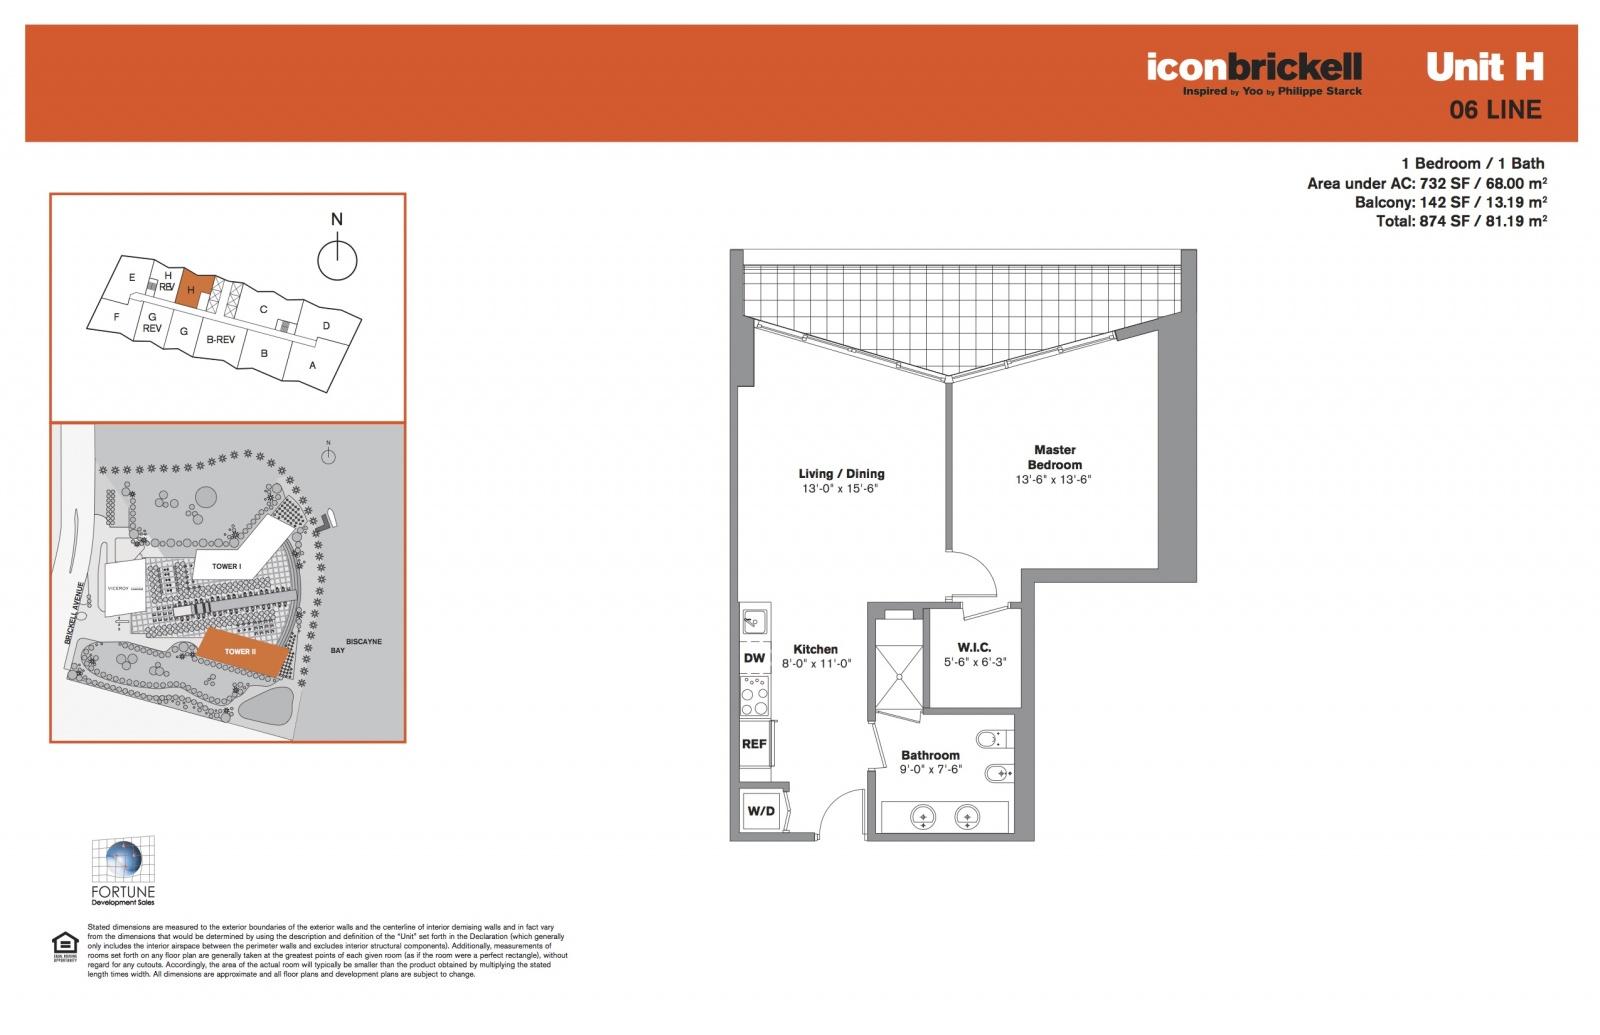 Icon Brickell Two, line 06 floor plan